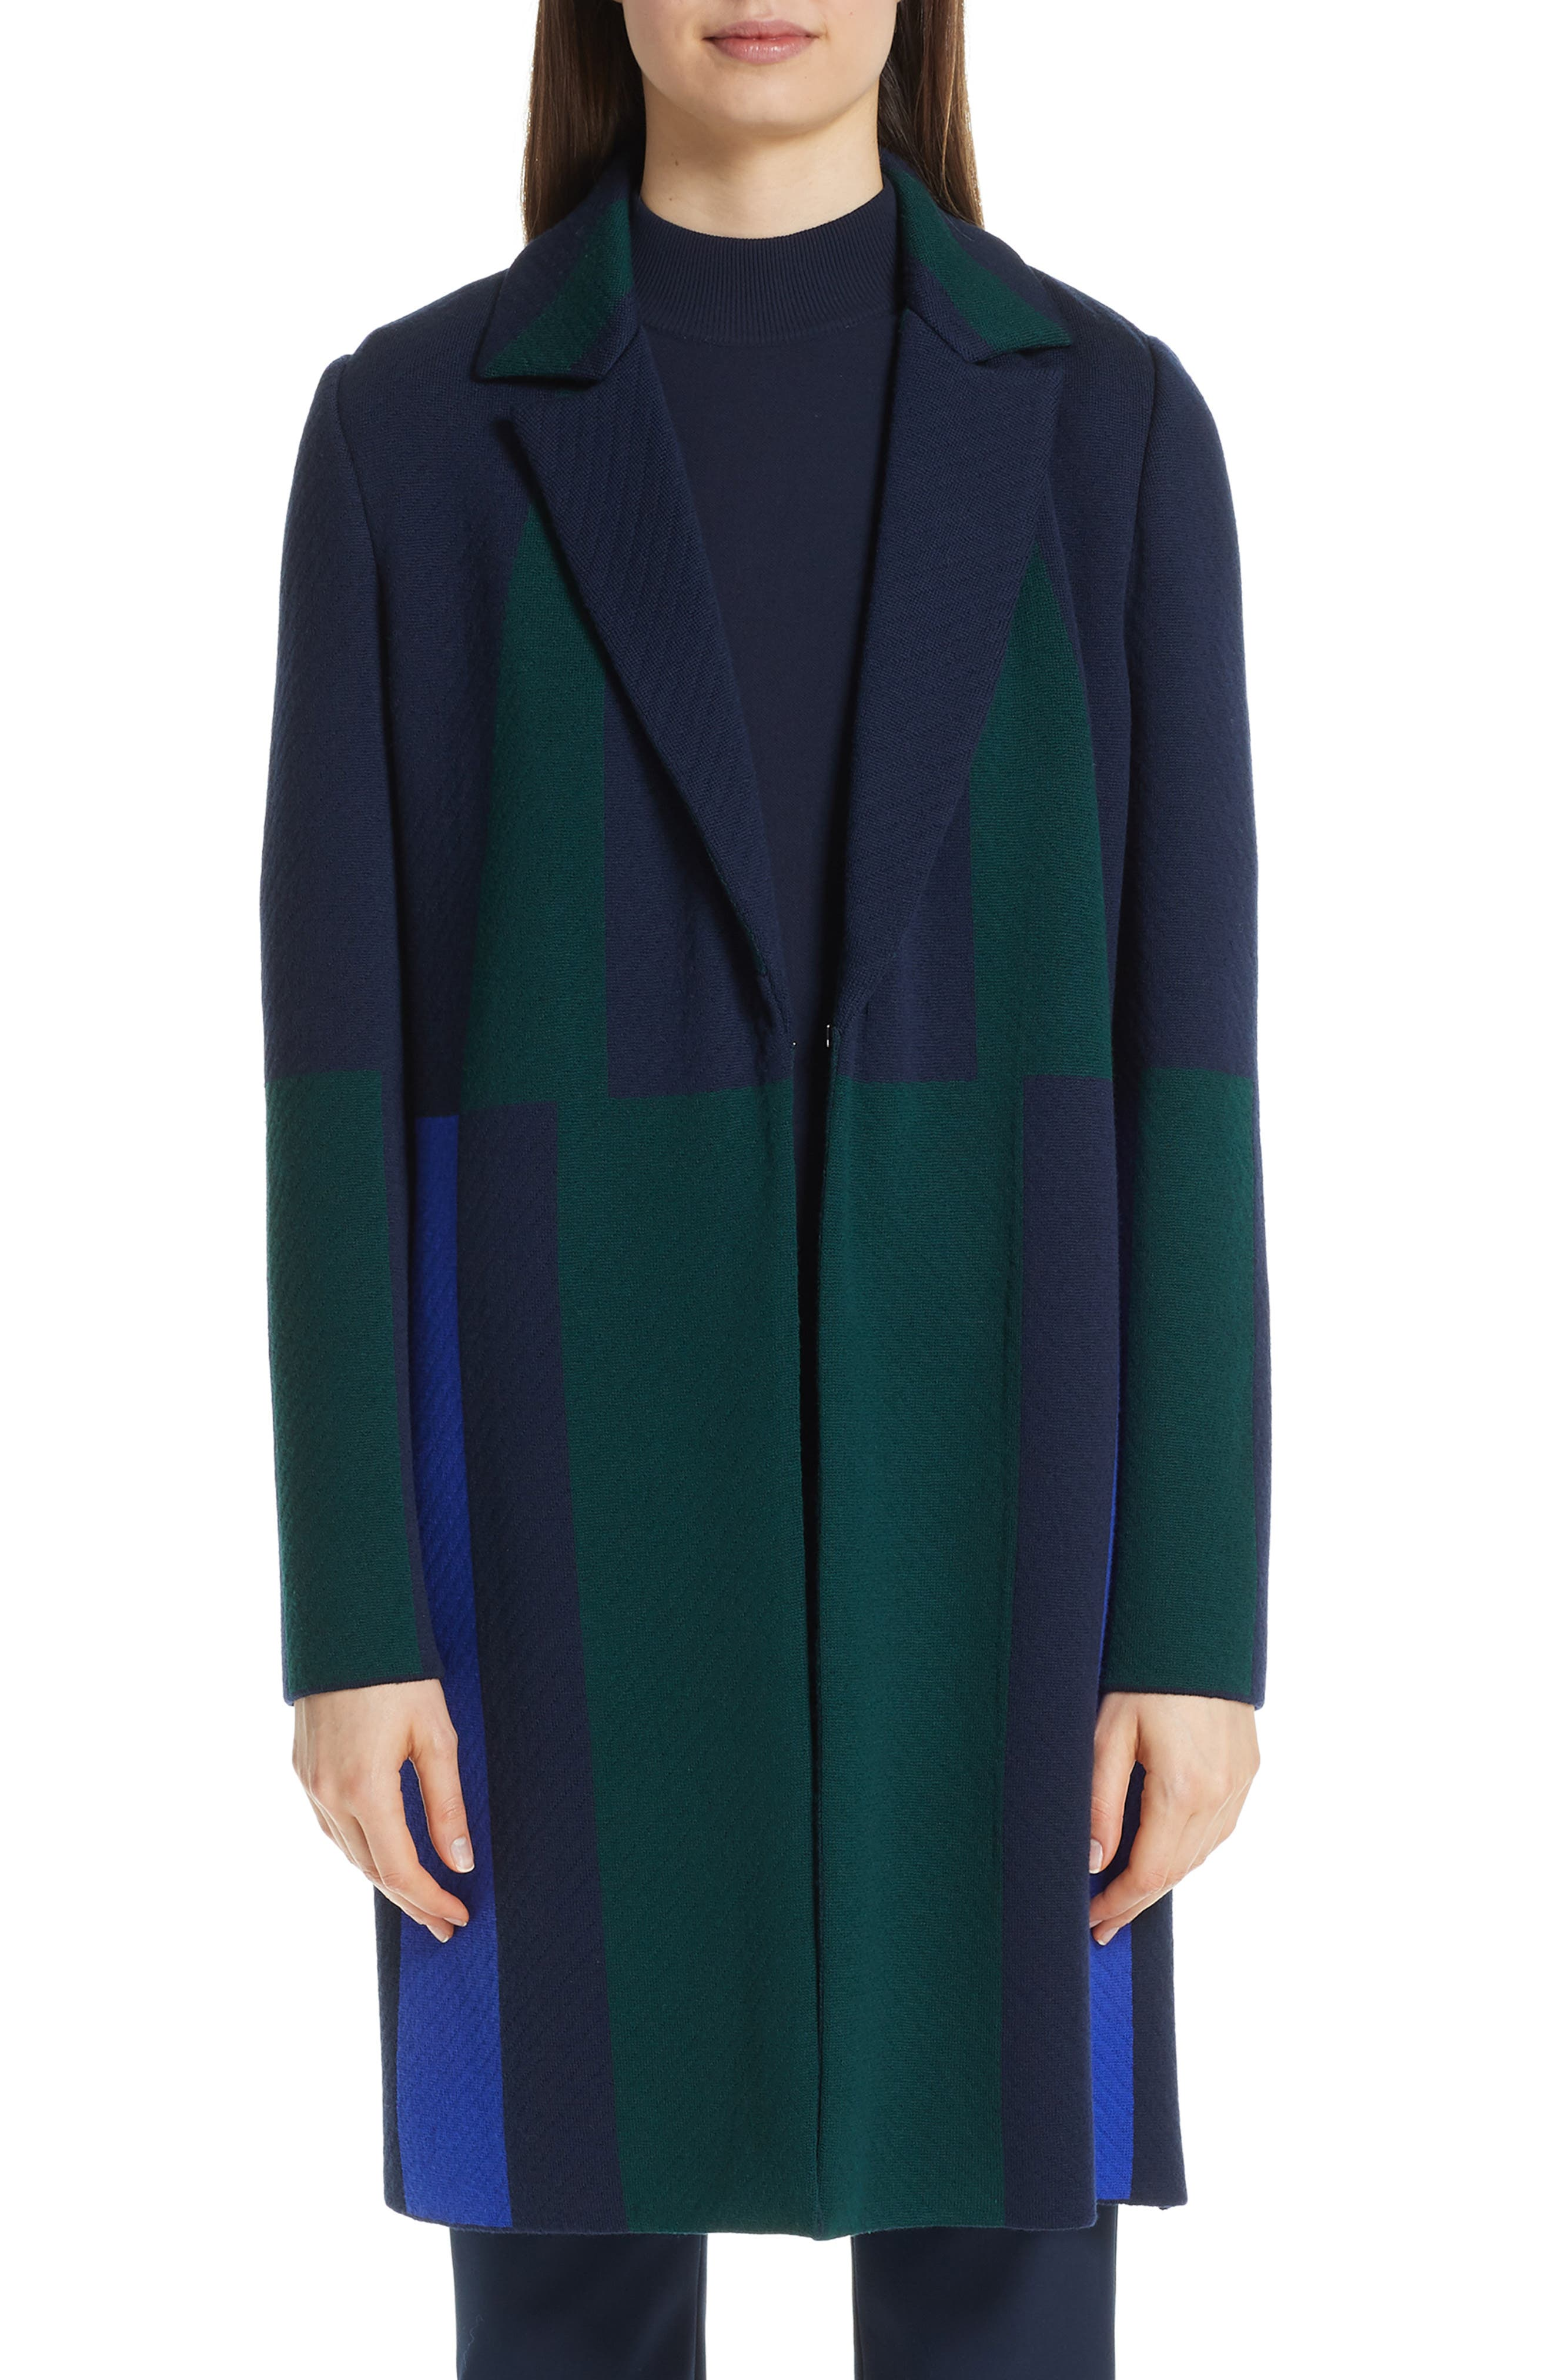 Colorblock Intarsia Wool Twill Jacket,                         Main,                         color, NAVY MULTI